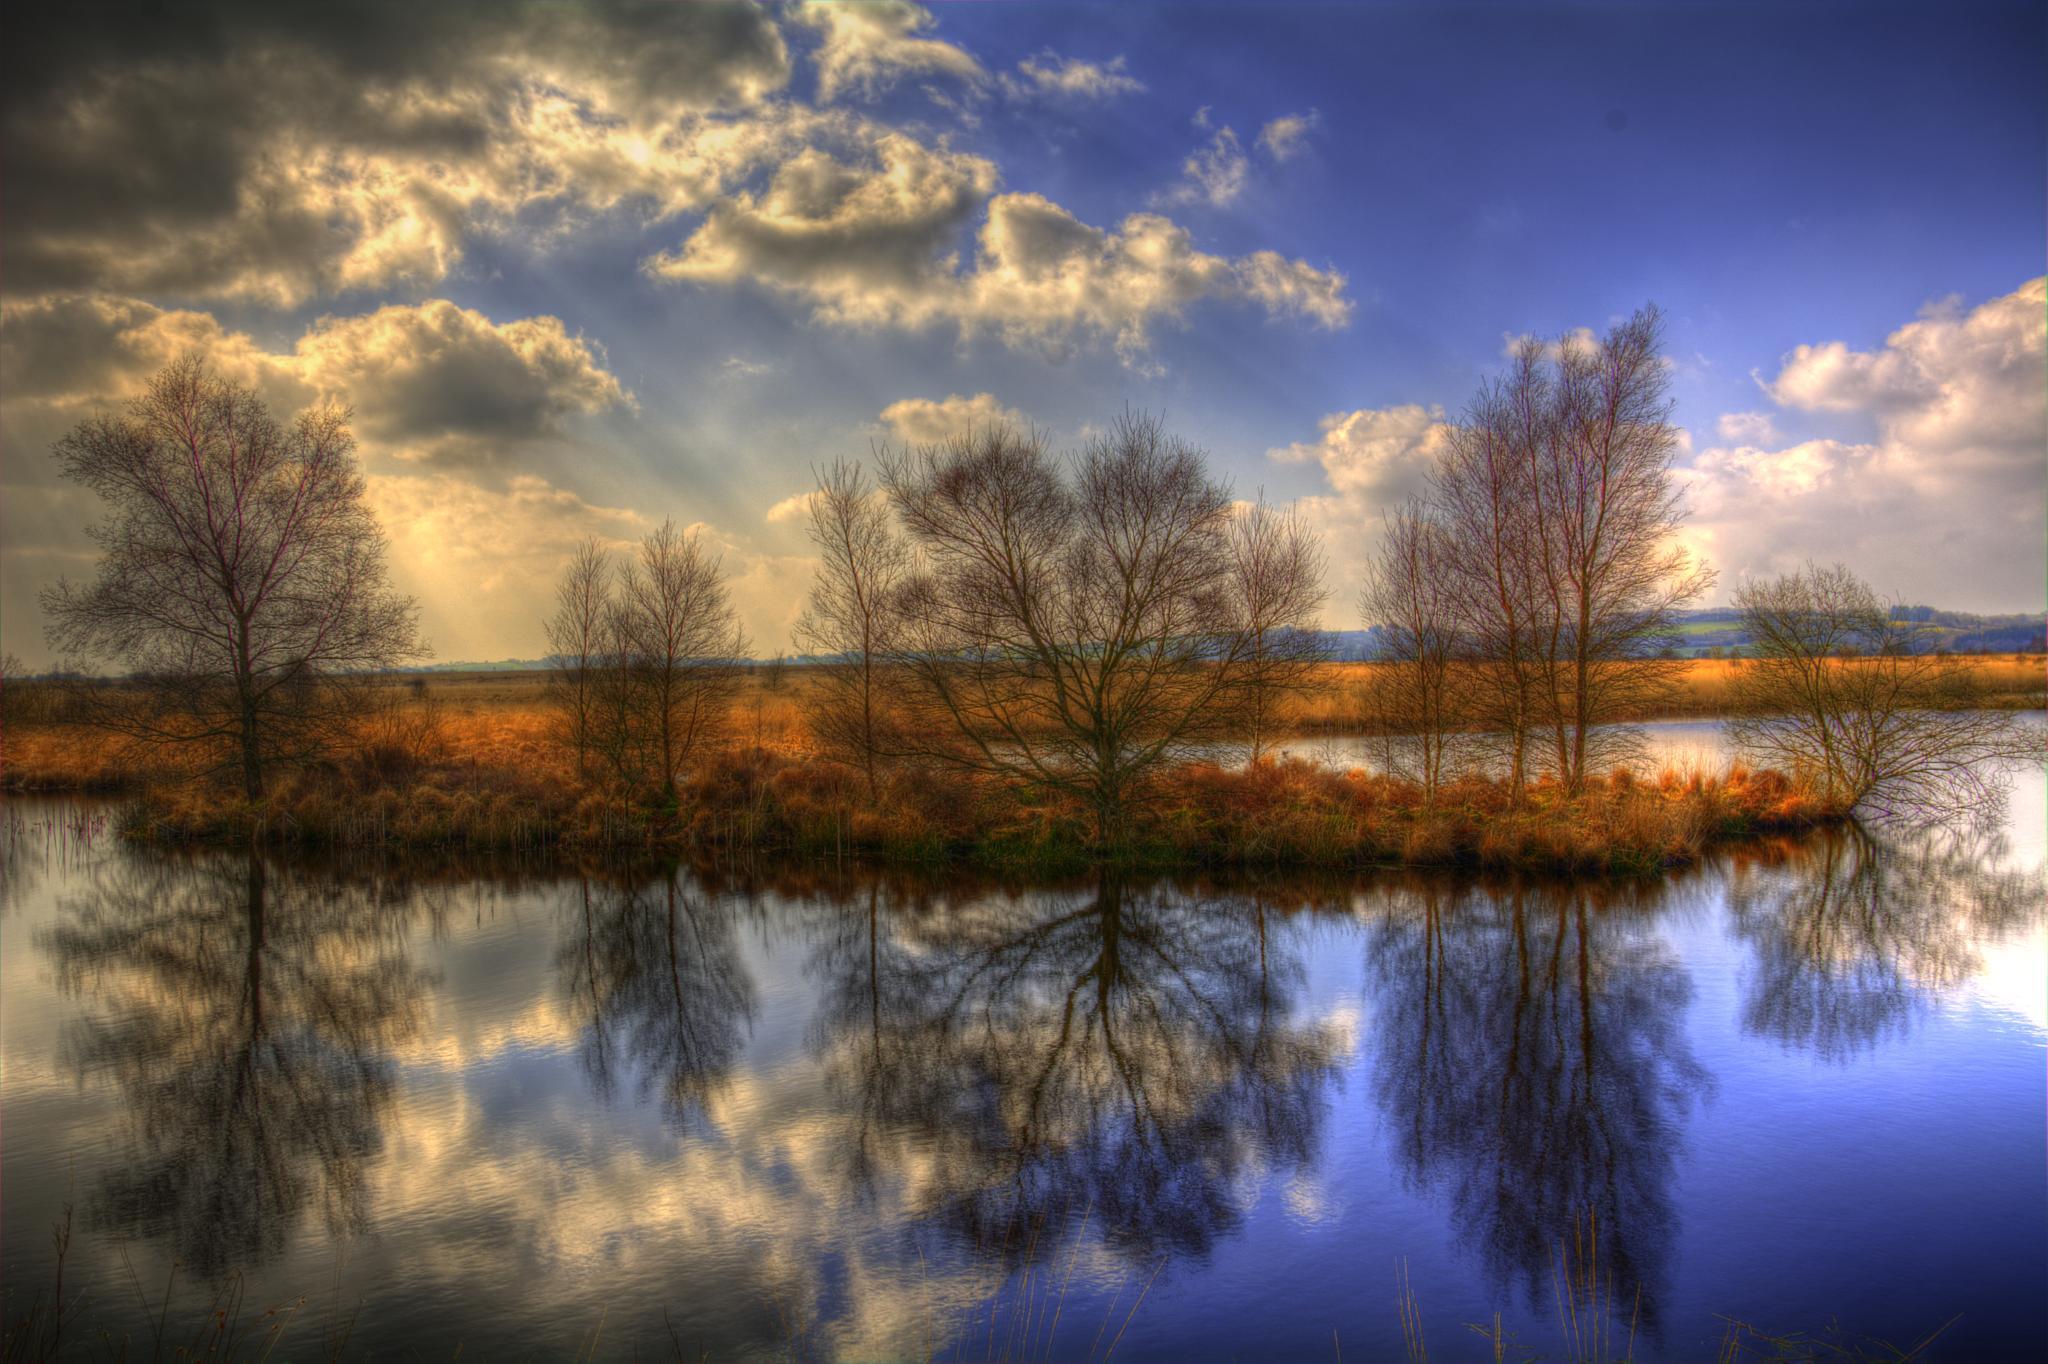 Cors Caron Island Lake by mike.lloyd.125